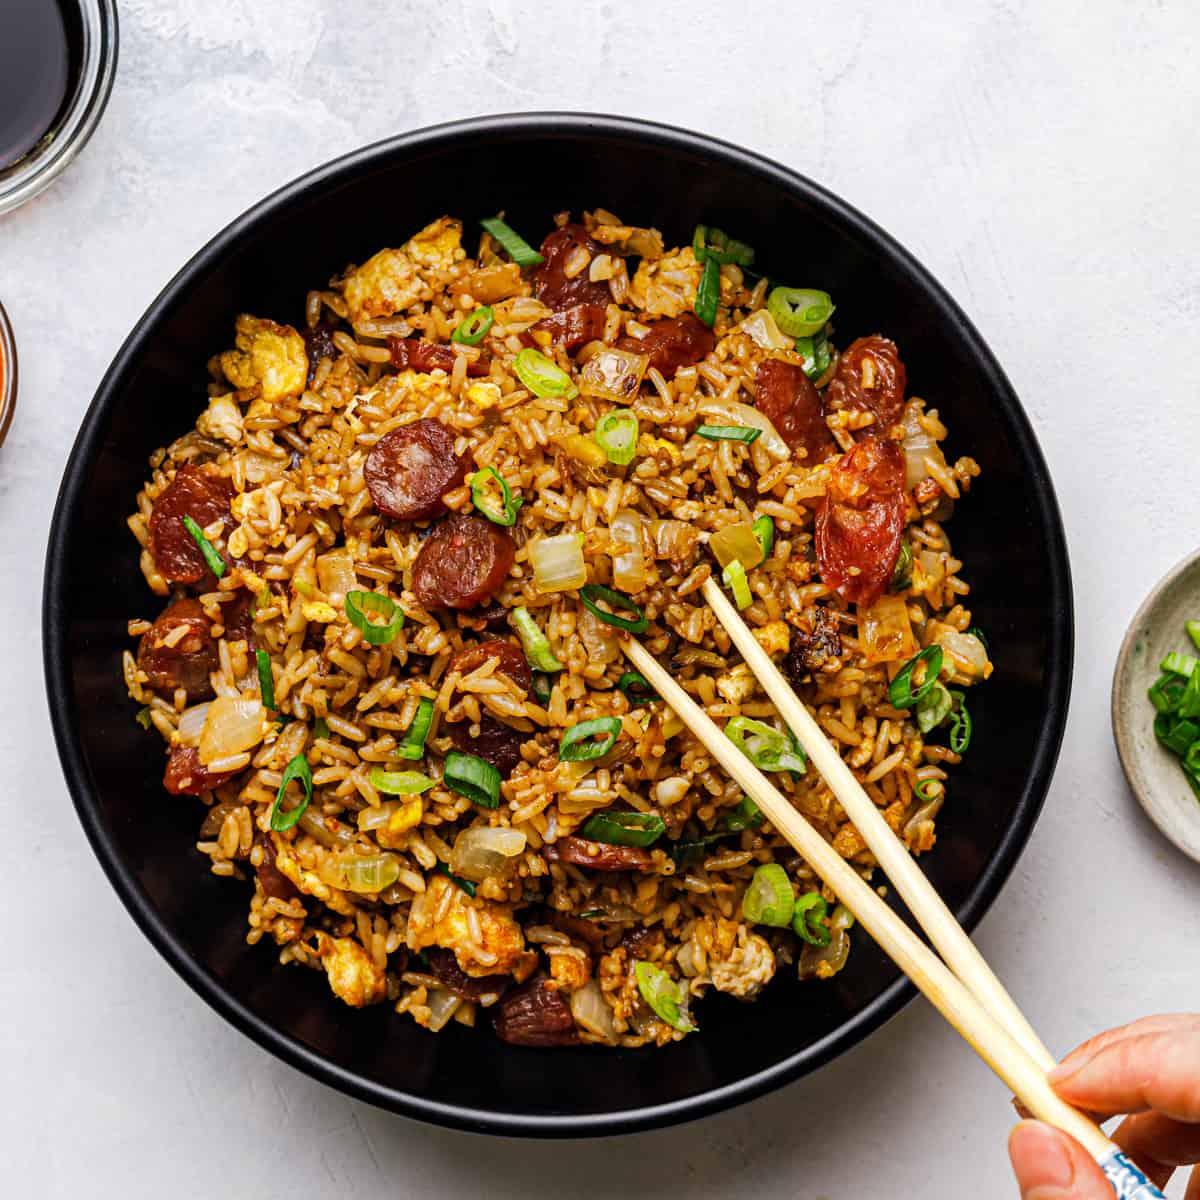 lop cheung chow fan 香肠炒饭